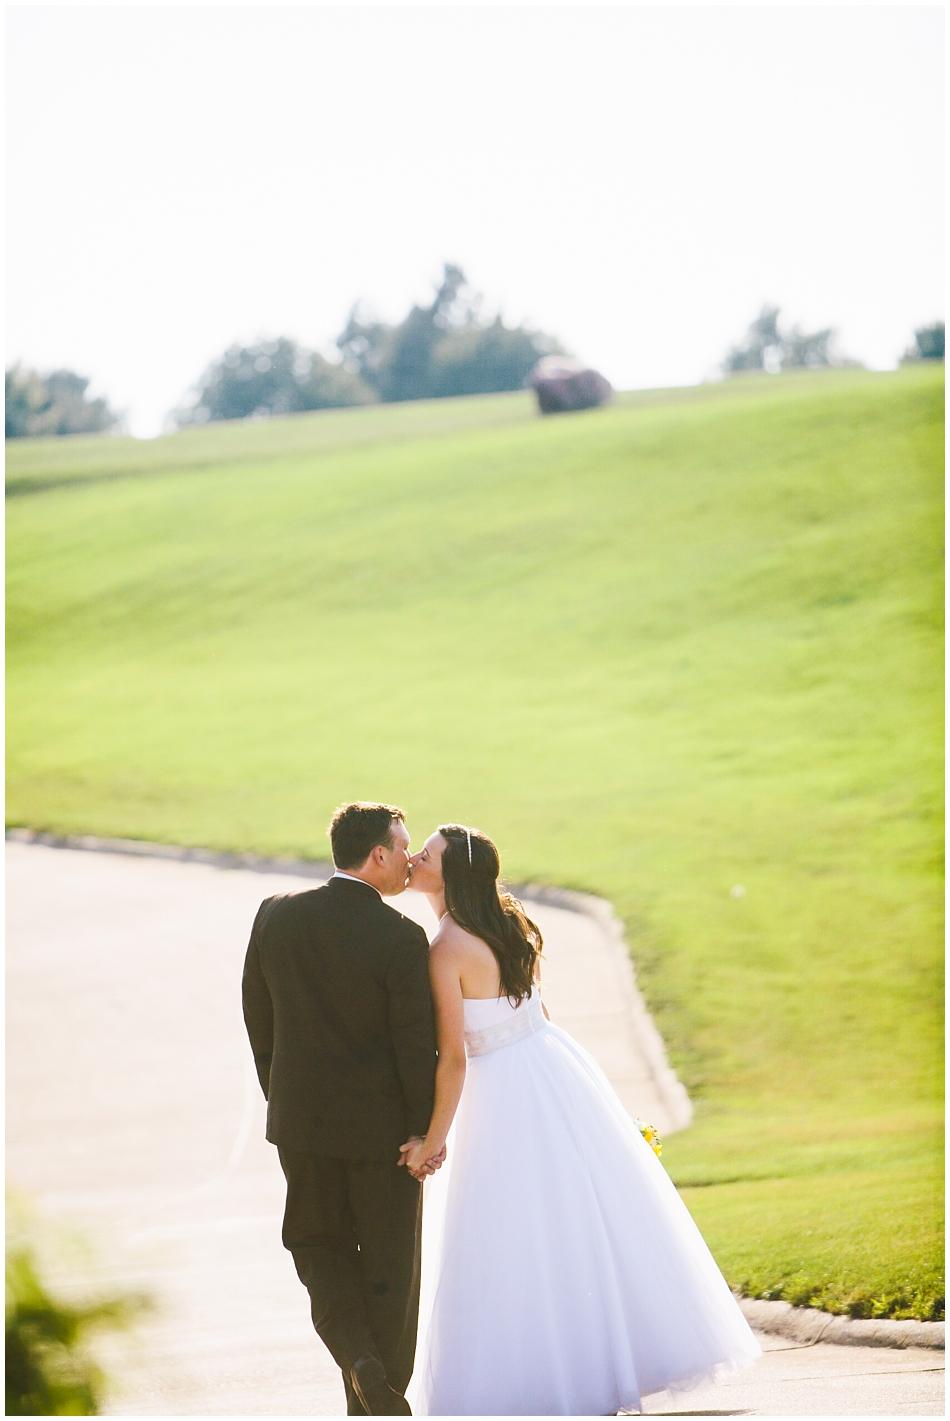 Bride and Groom walking away on wedding day in Omaha, Nebraska